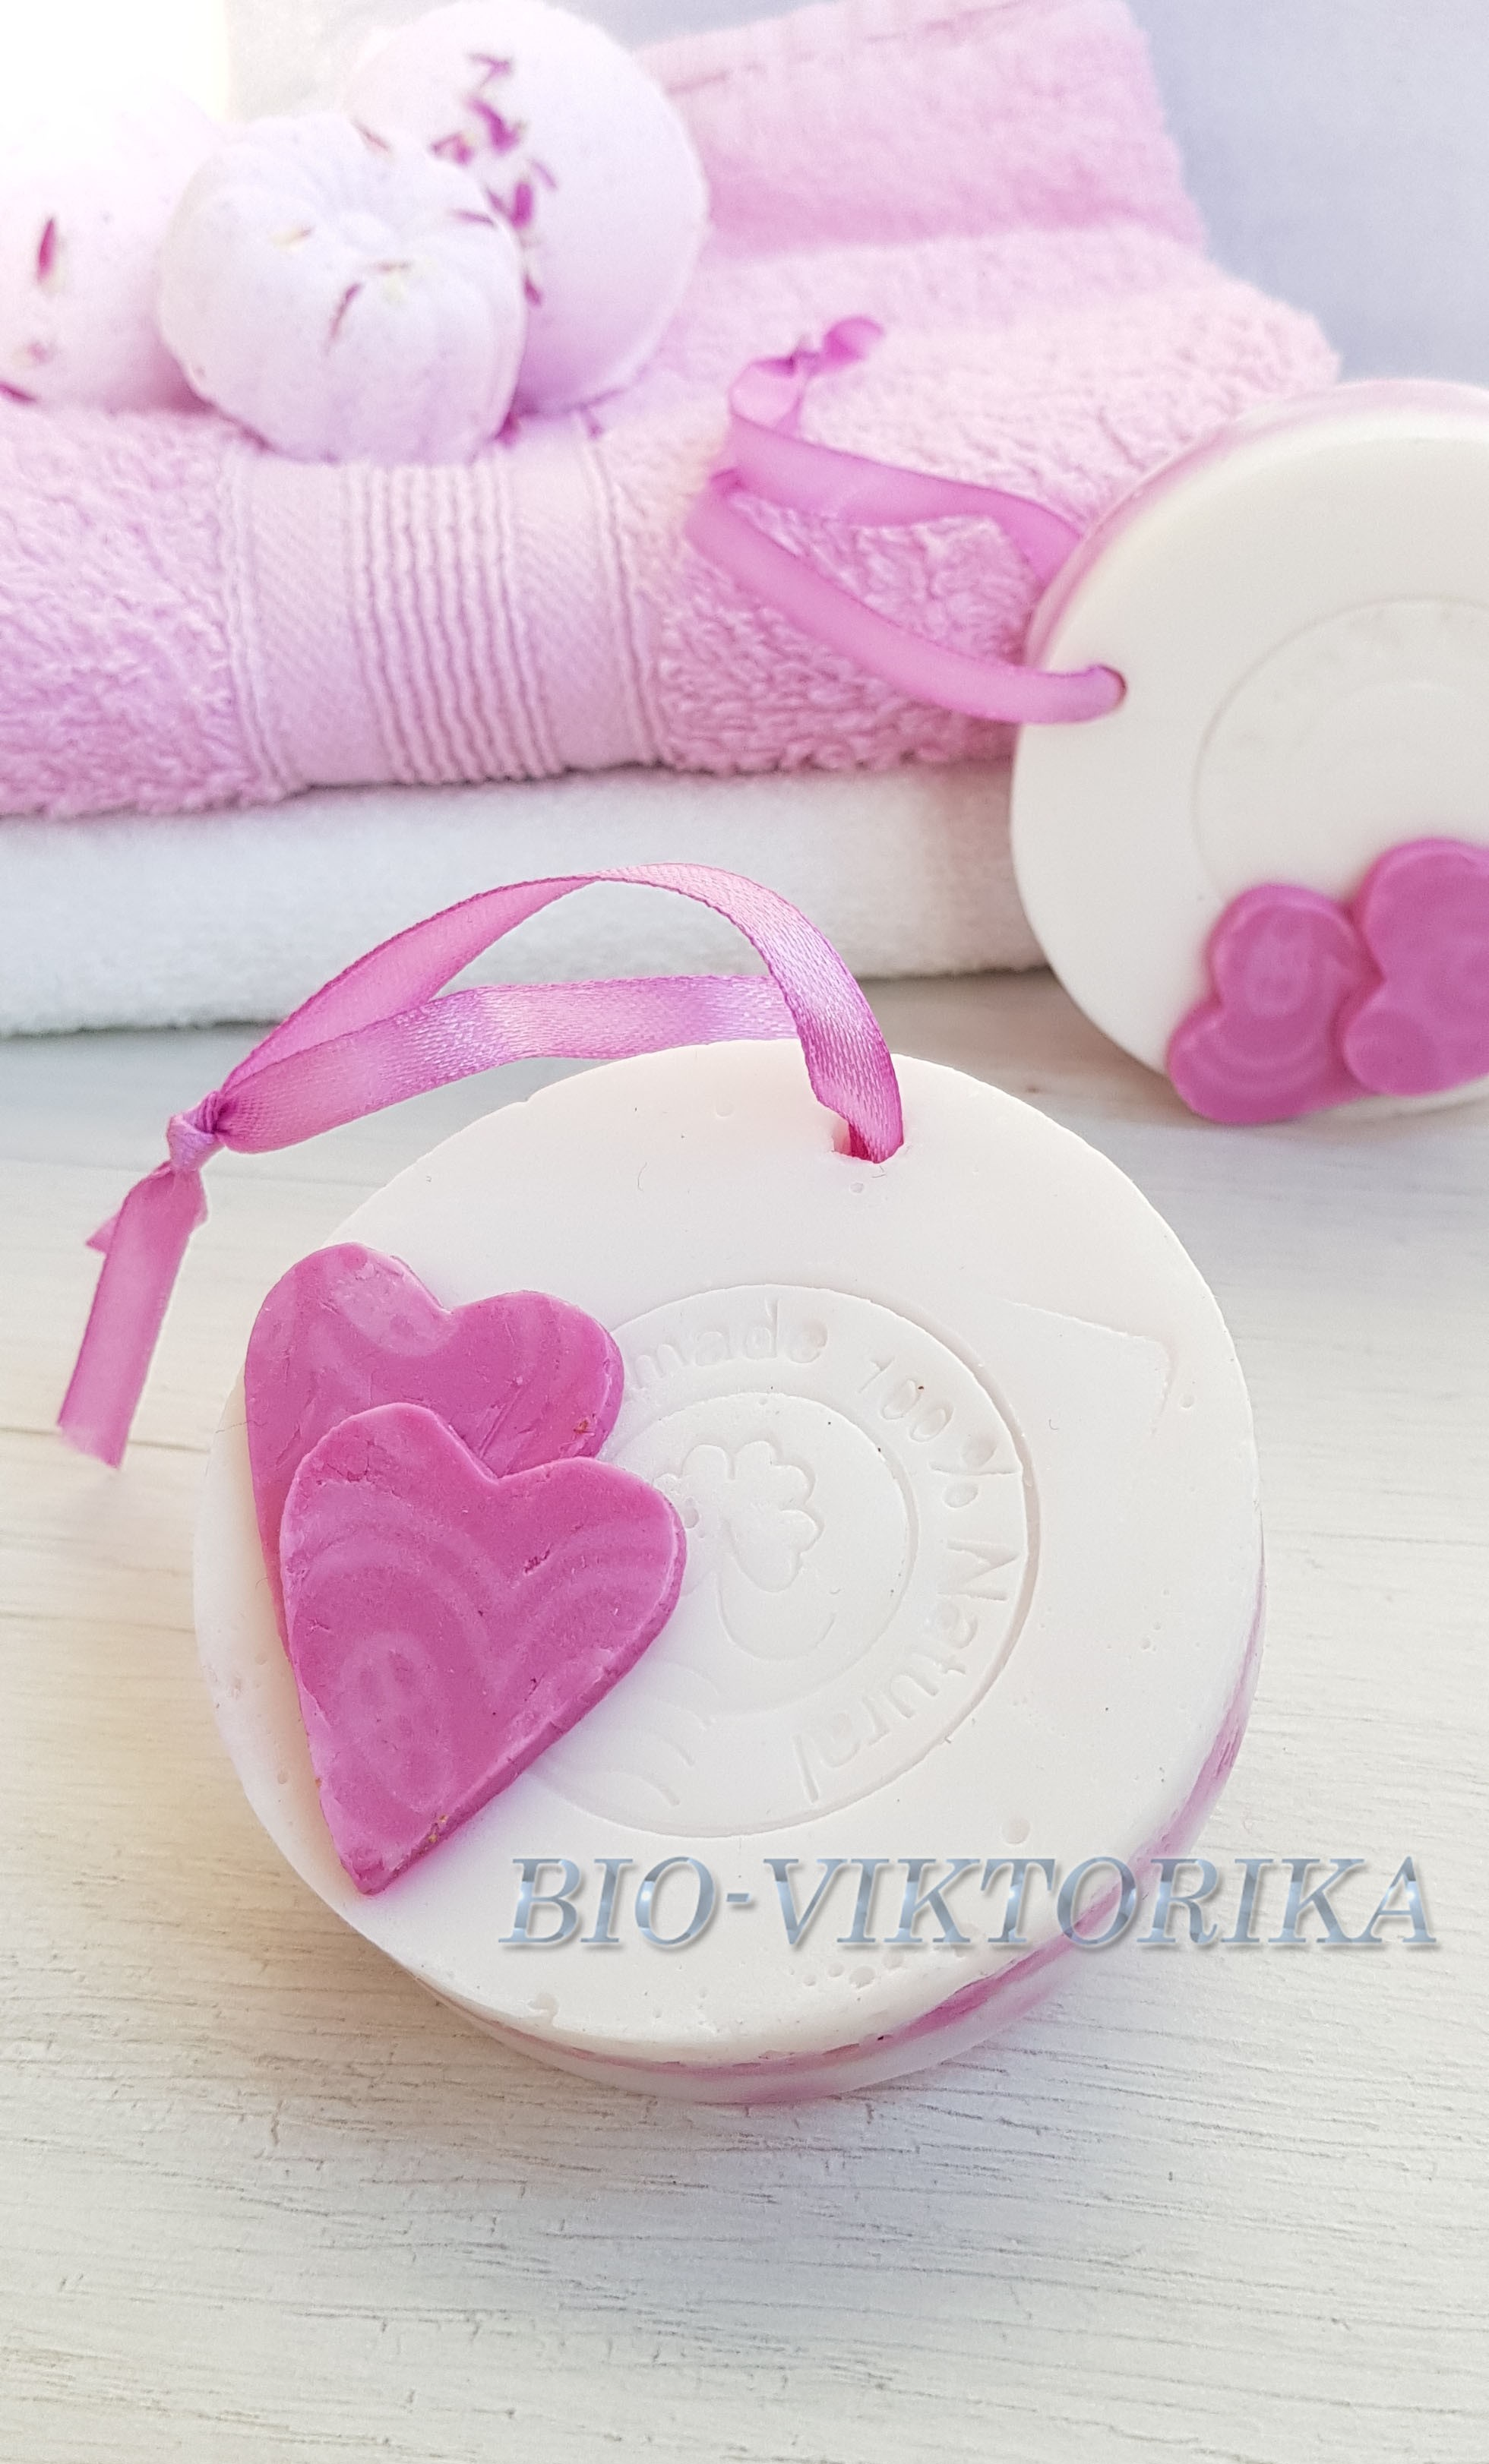 Bio-Viktorika Увлажняющее мыло